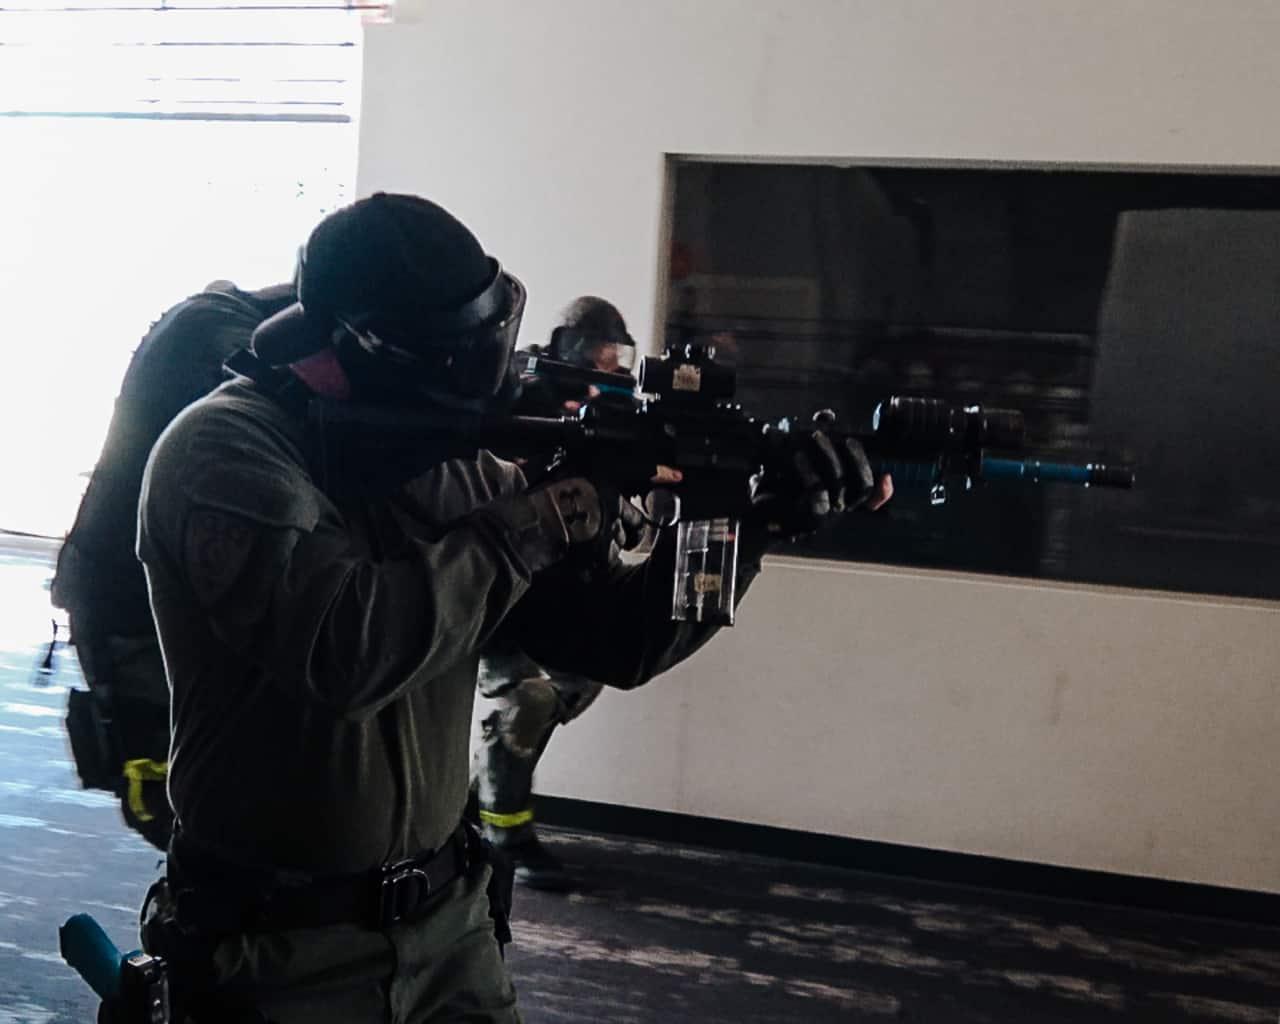 SWAT entry team working through building hallway